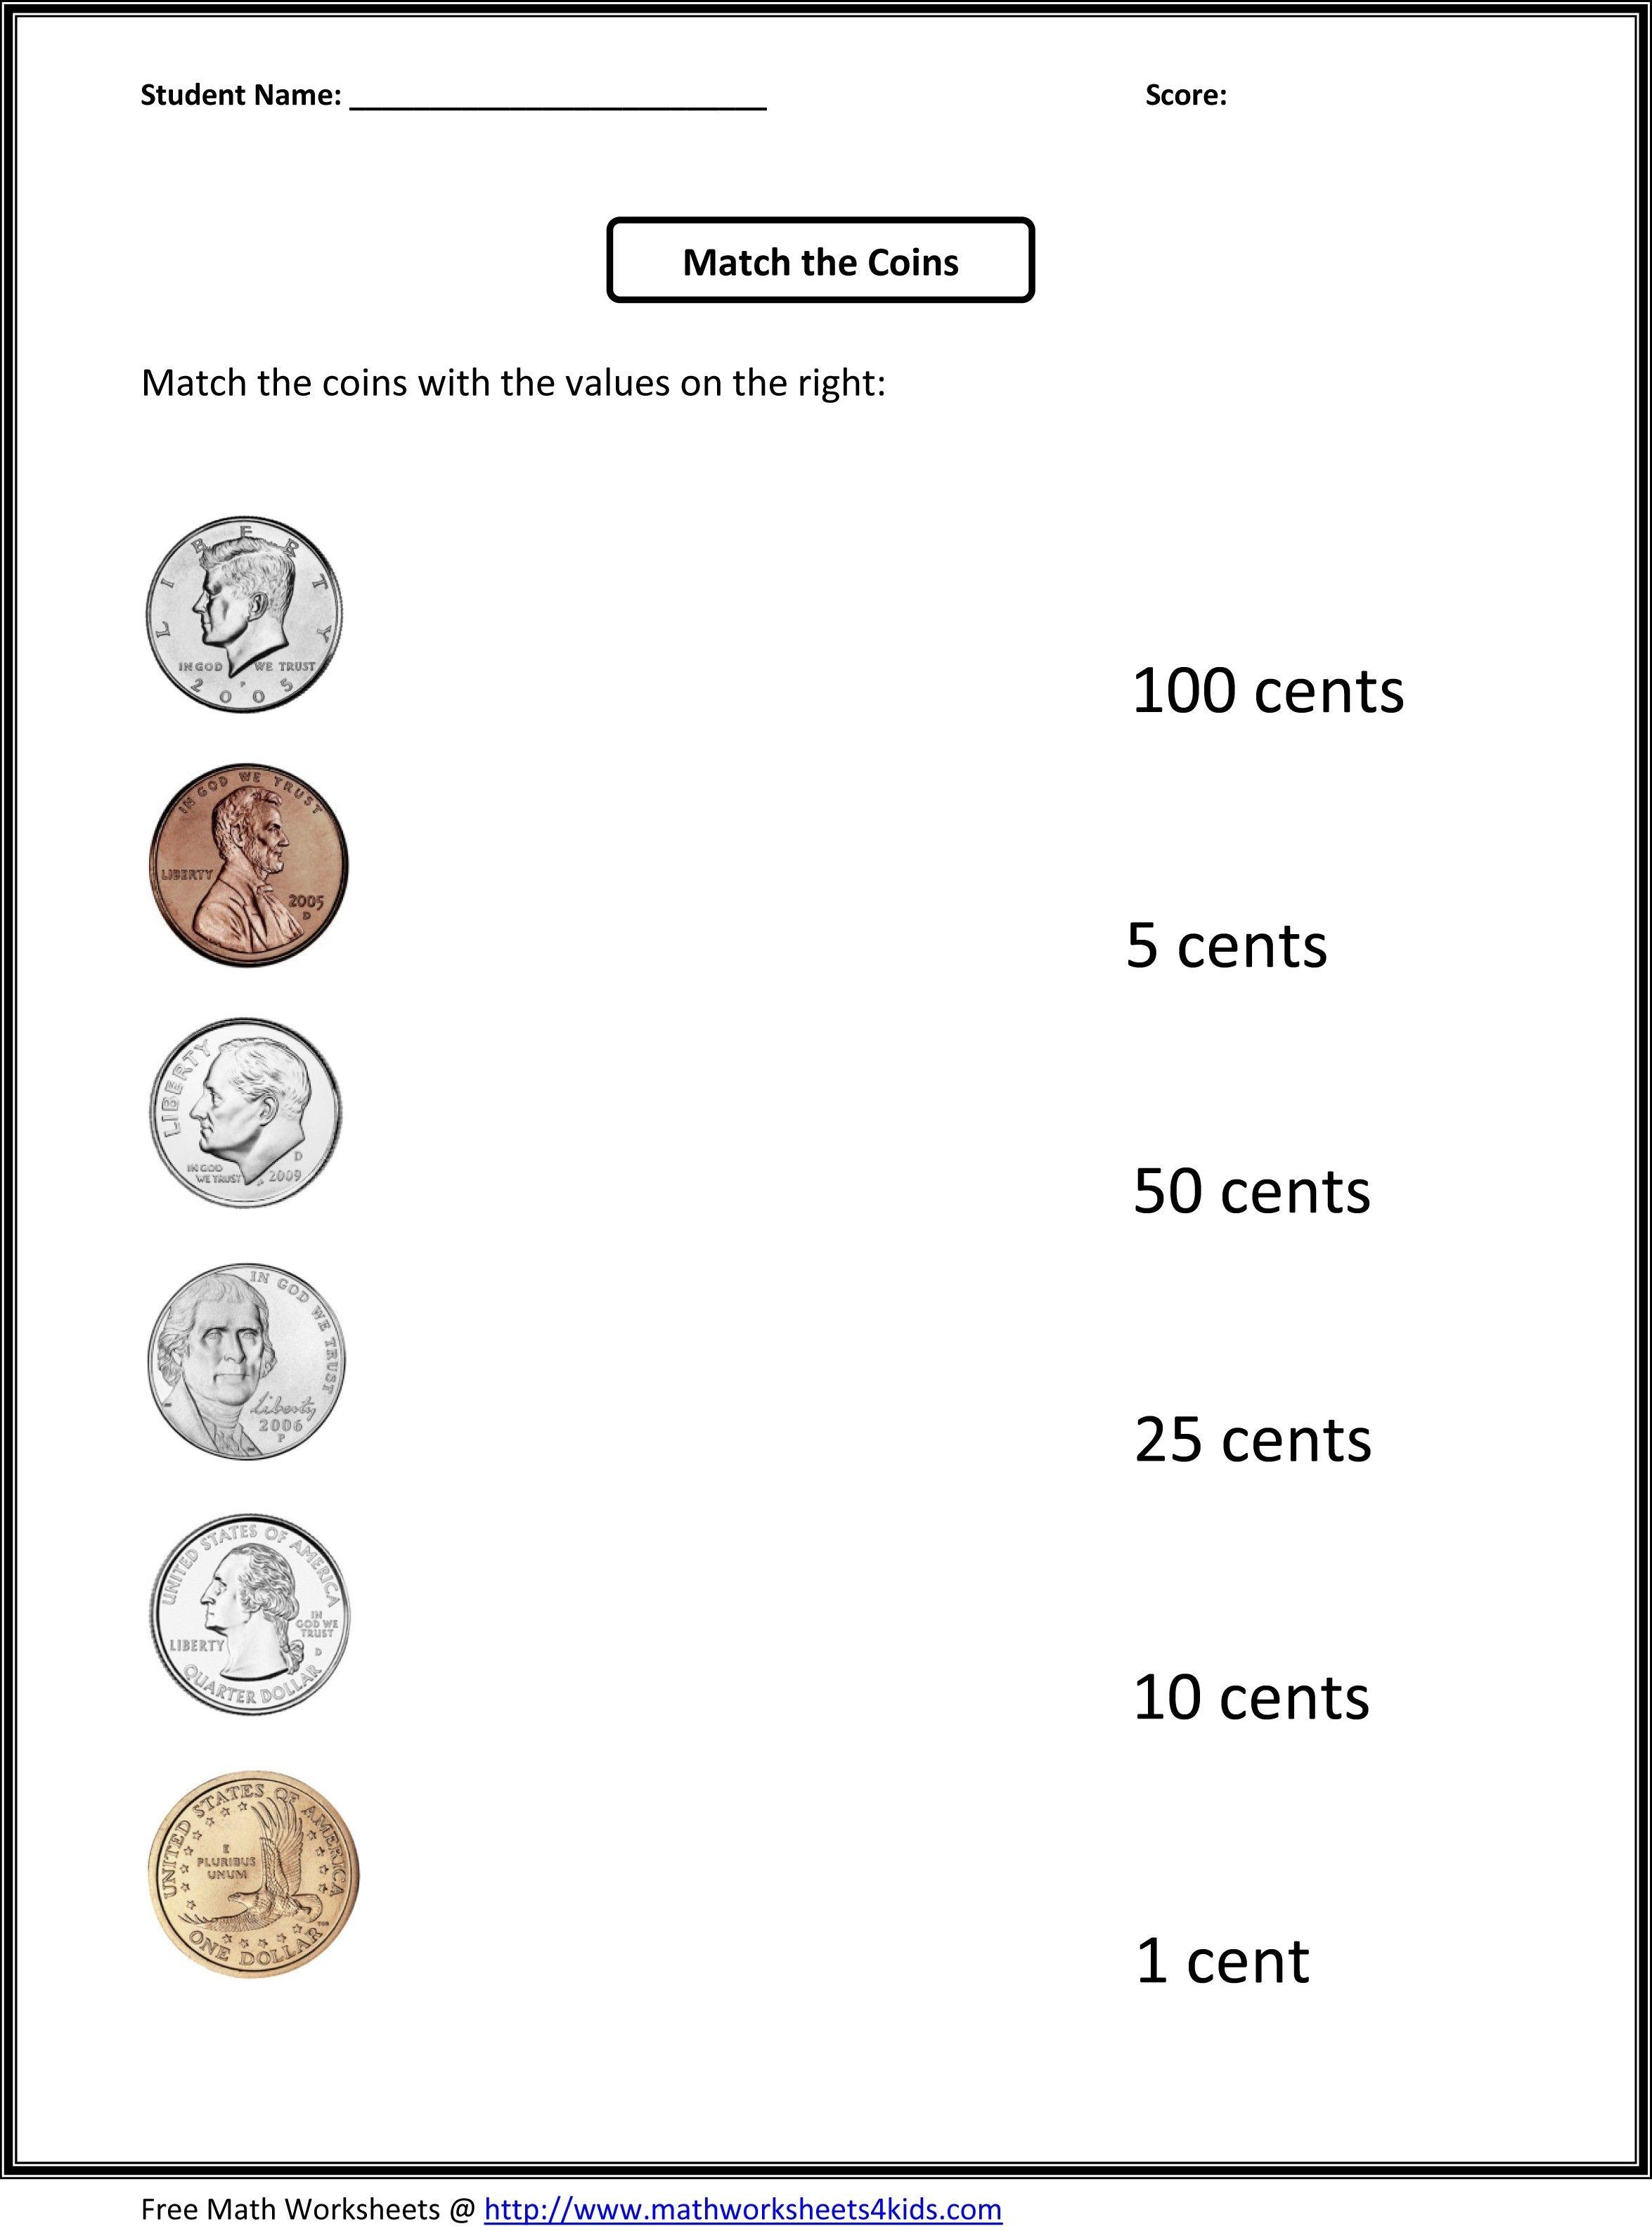 Best Of Printable Money Worksheets First Grade | Fun Worksheet - Free Printable Money Worksheets